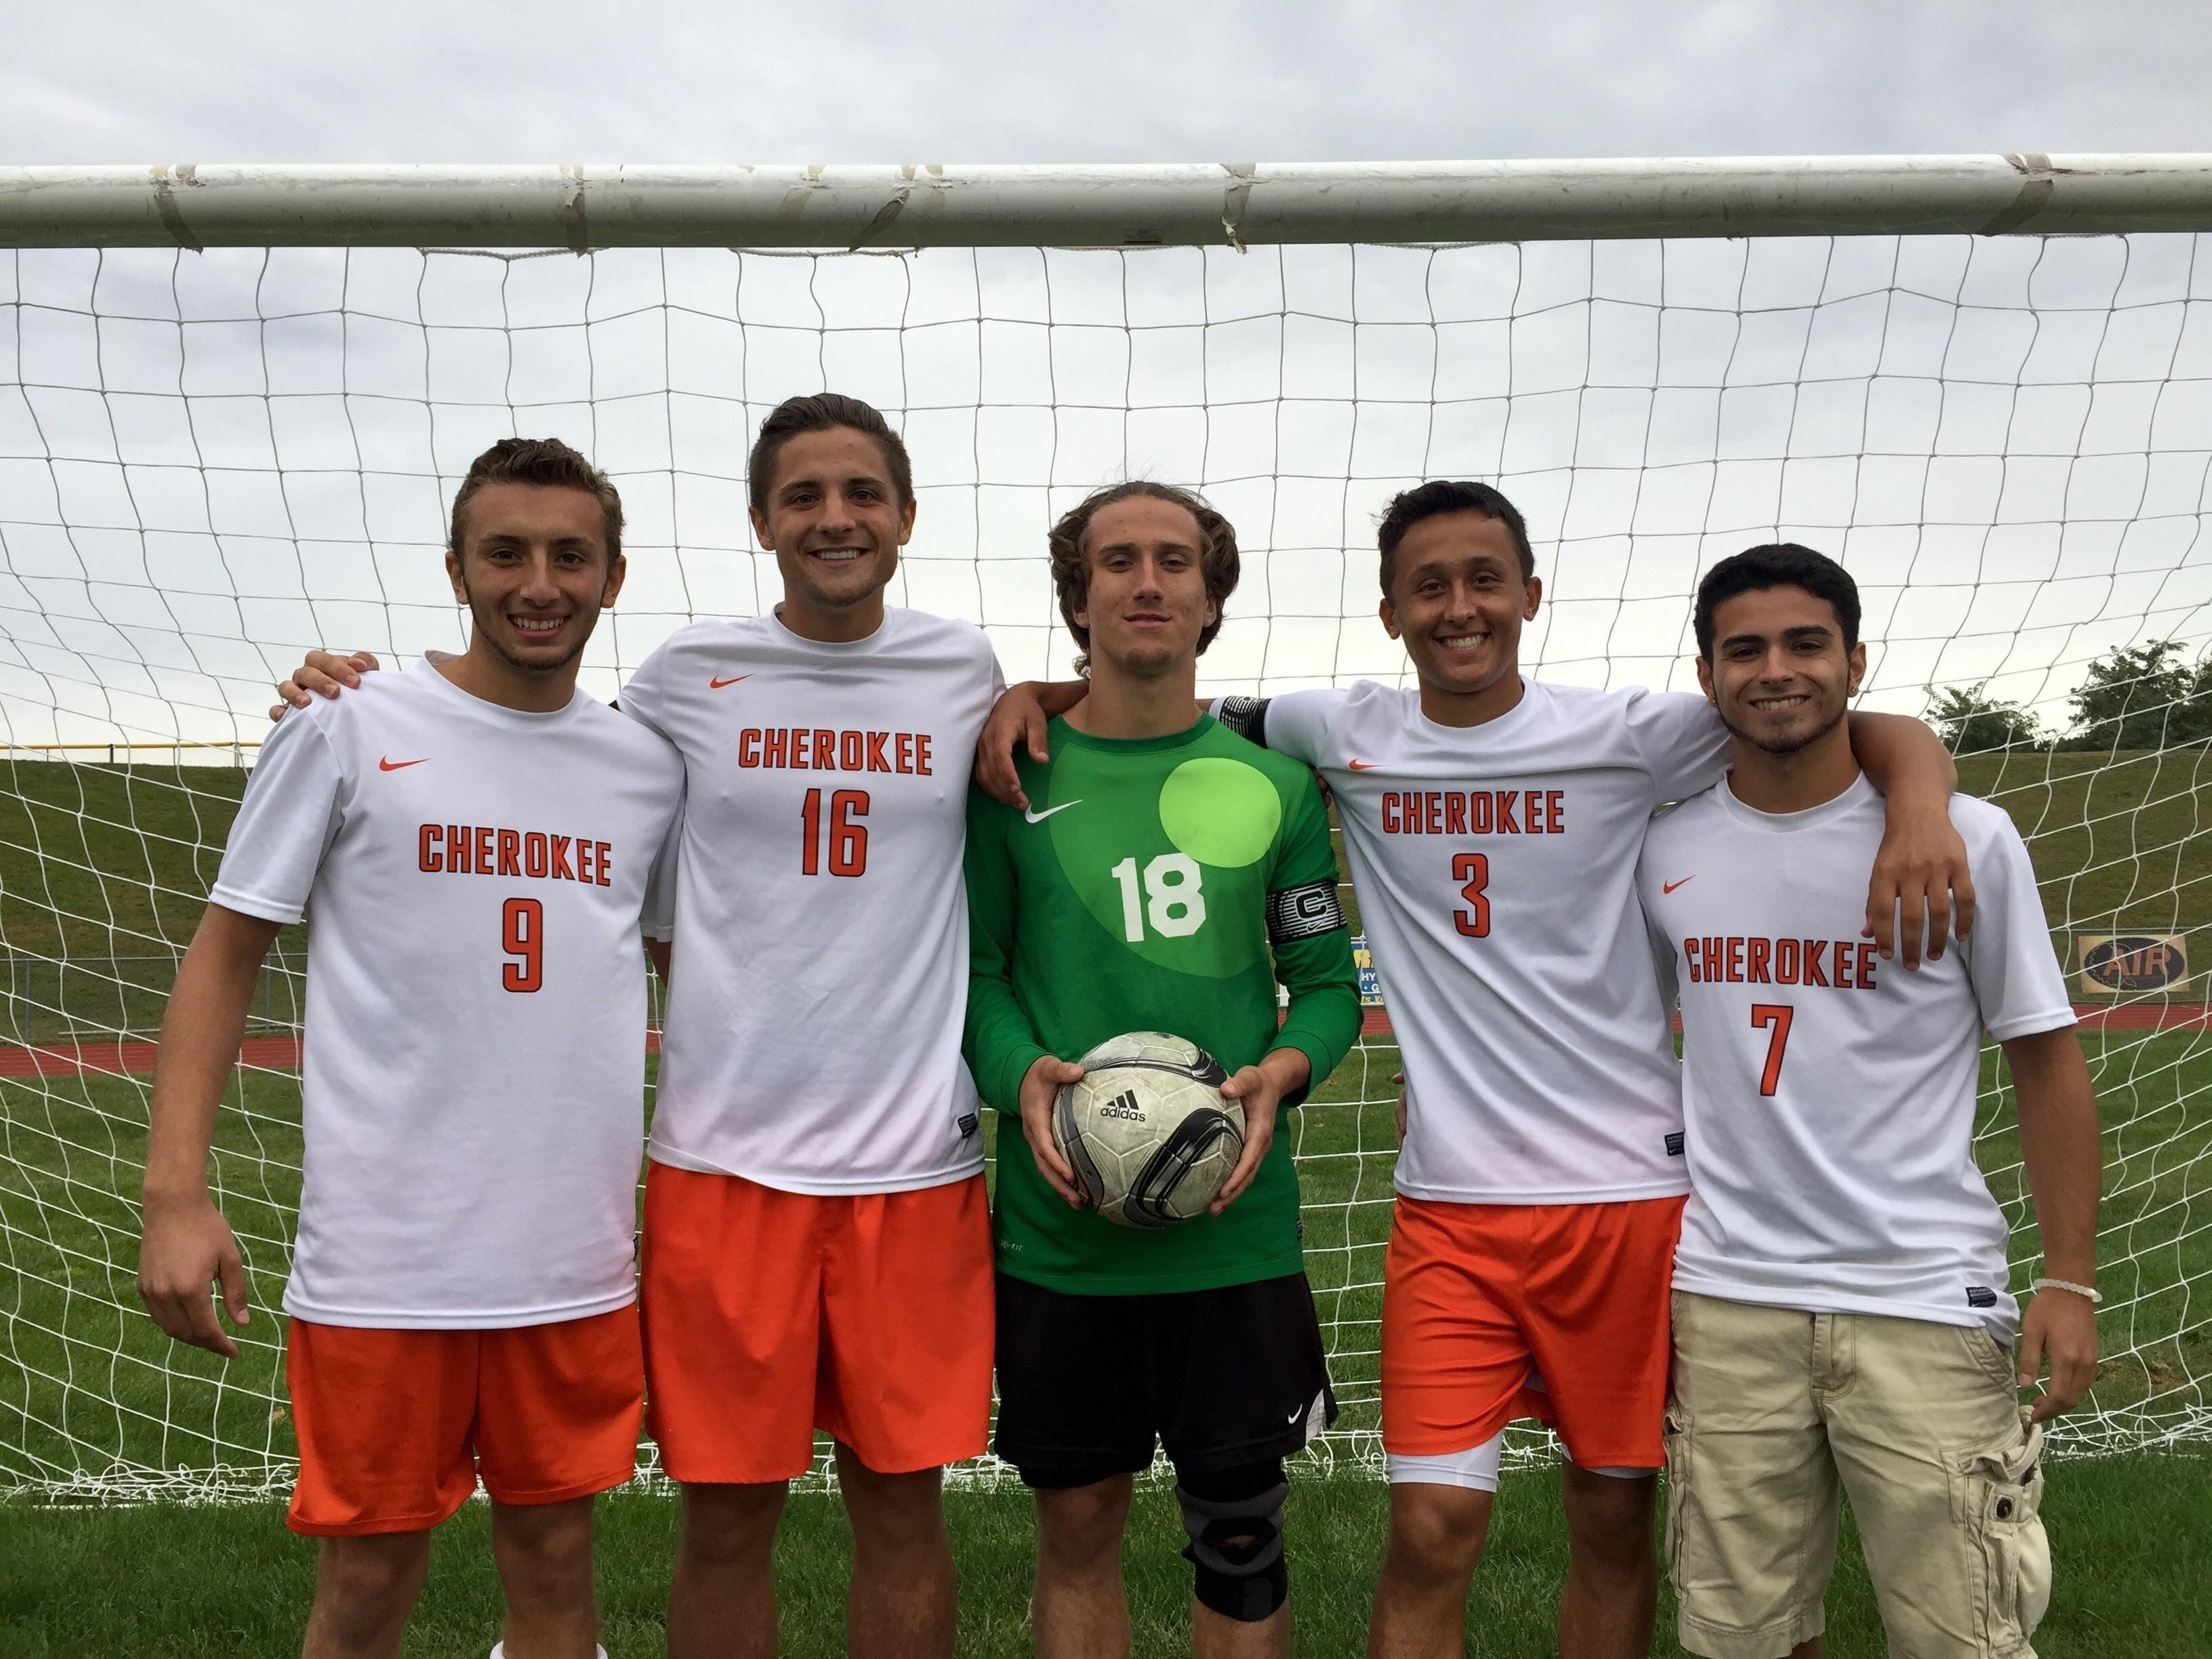 The Cherokee High School boys' soccer team seniors include Eamon McCarren, Mario LaMorte, Zach Rowe, Cristian Ognibene and Justin McCarthy.